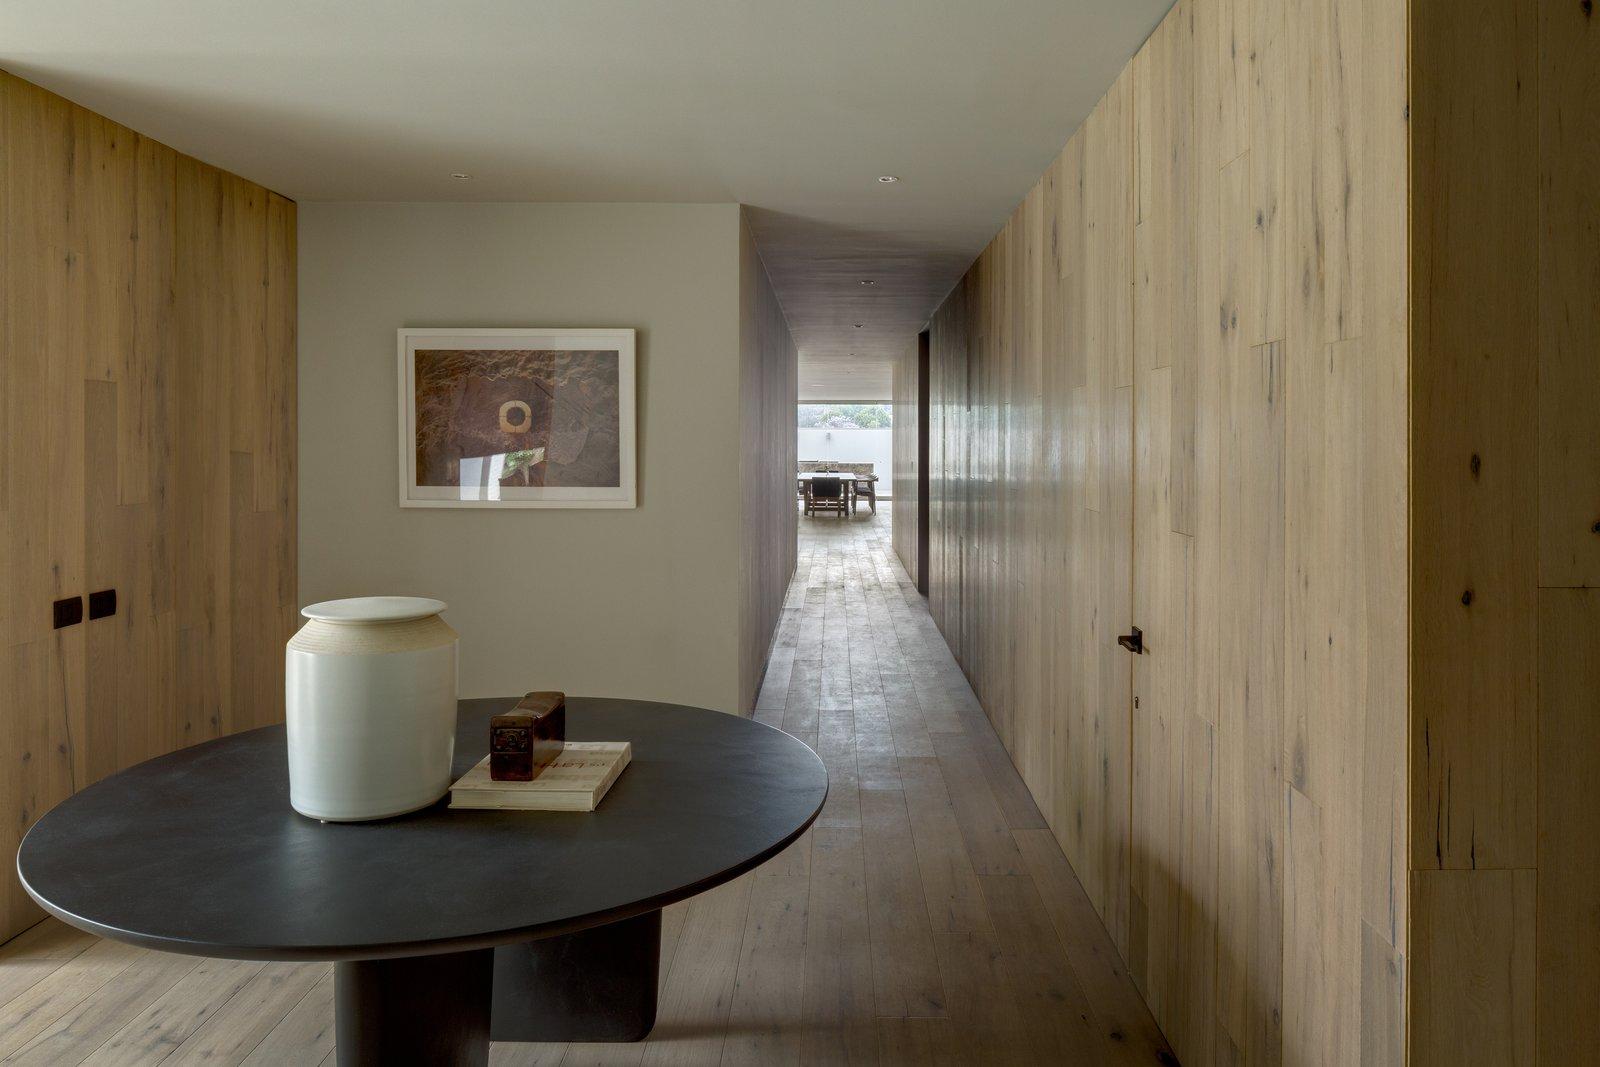 Hallway and Medium Hardwood Floor  Photo 12 of 20 in A Serene Home in Mexico Weaves Around Verdant Gardens